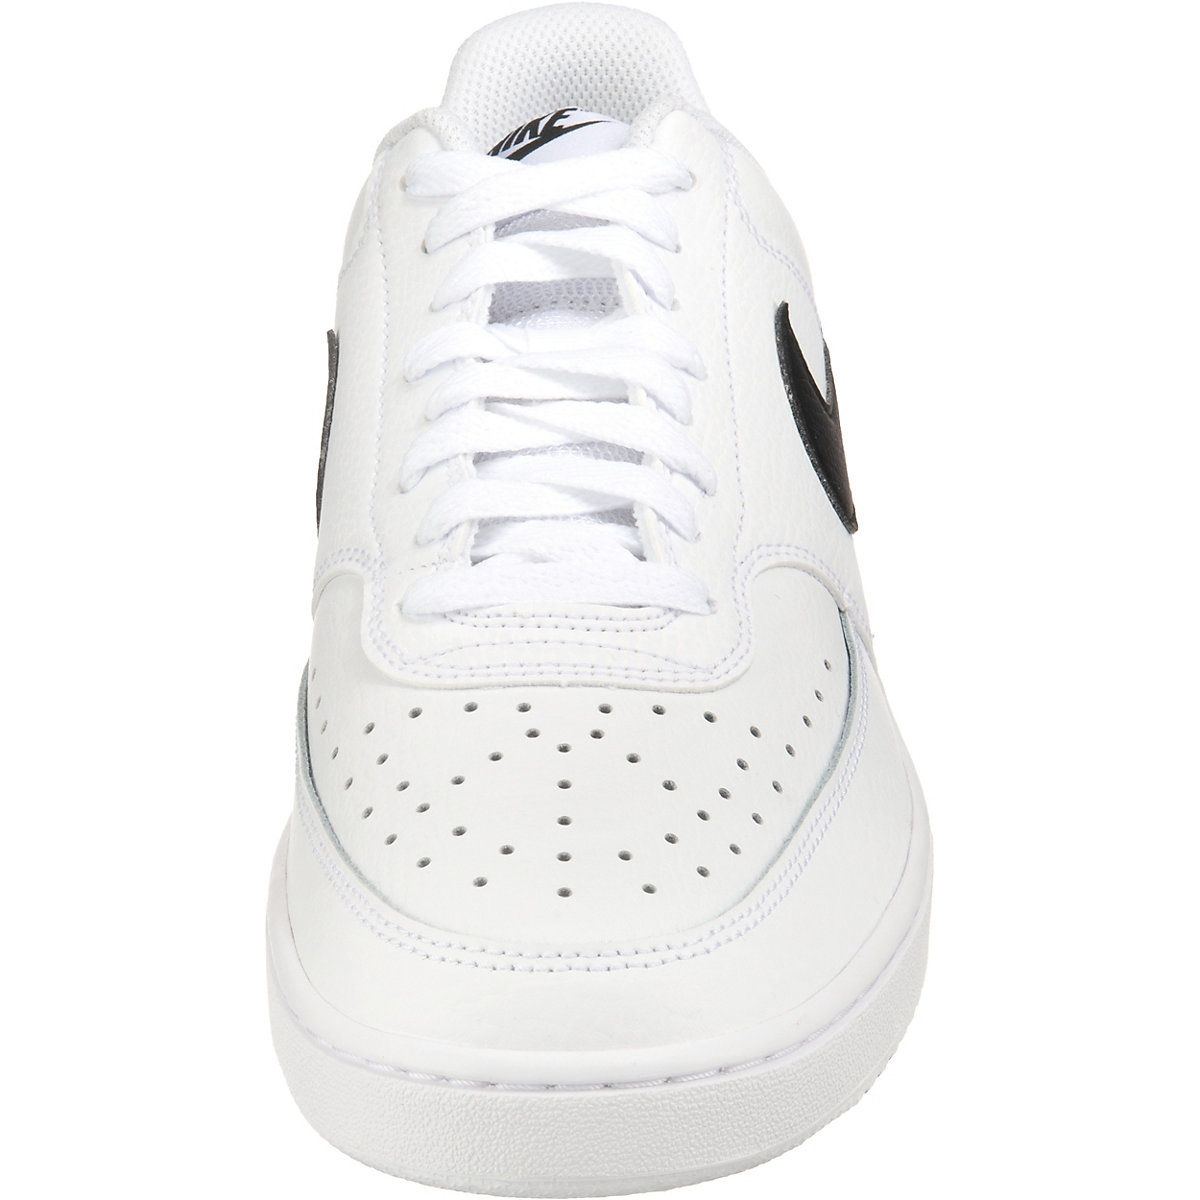 Nike Sportswear, Court Vision Low Sneakers Low, Weiß